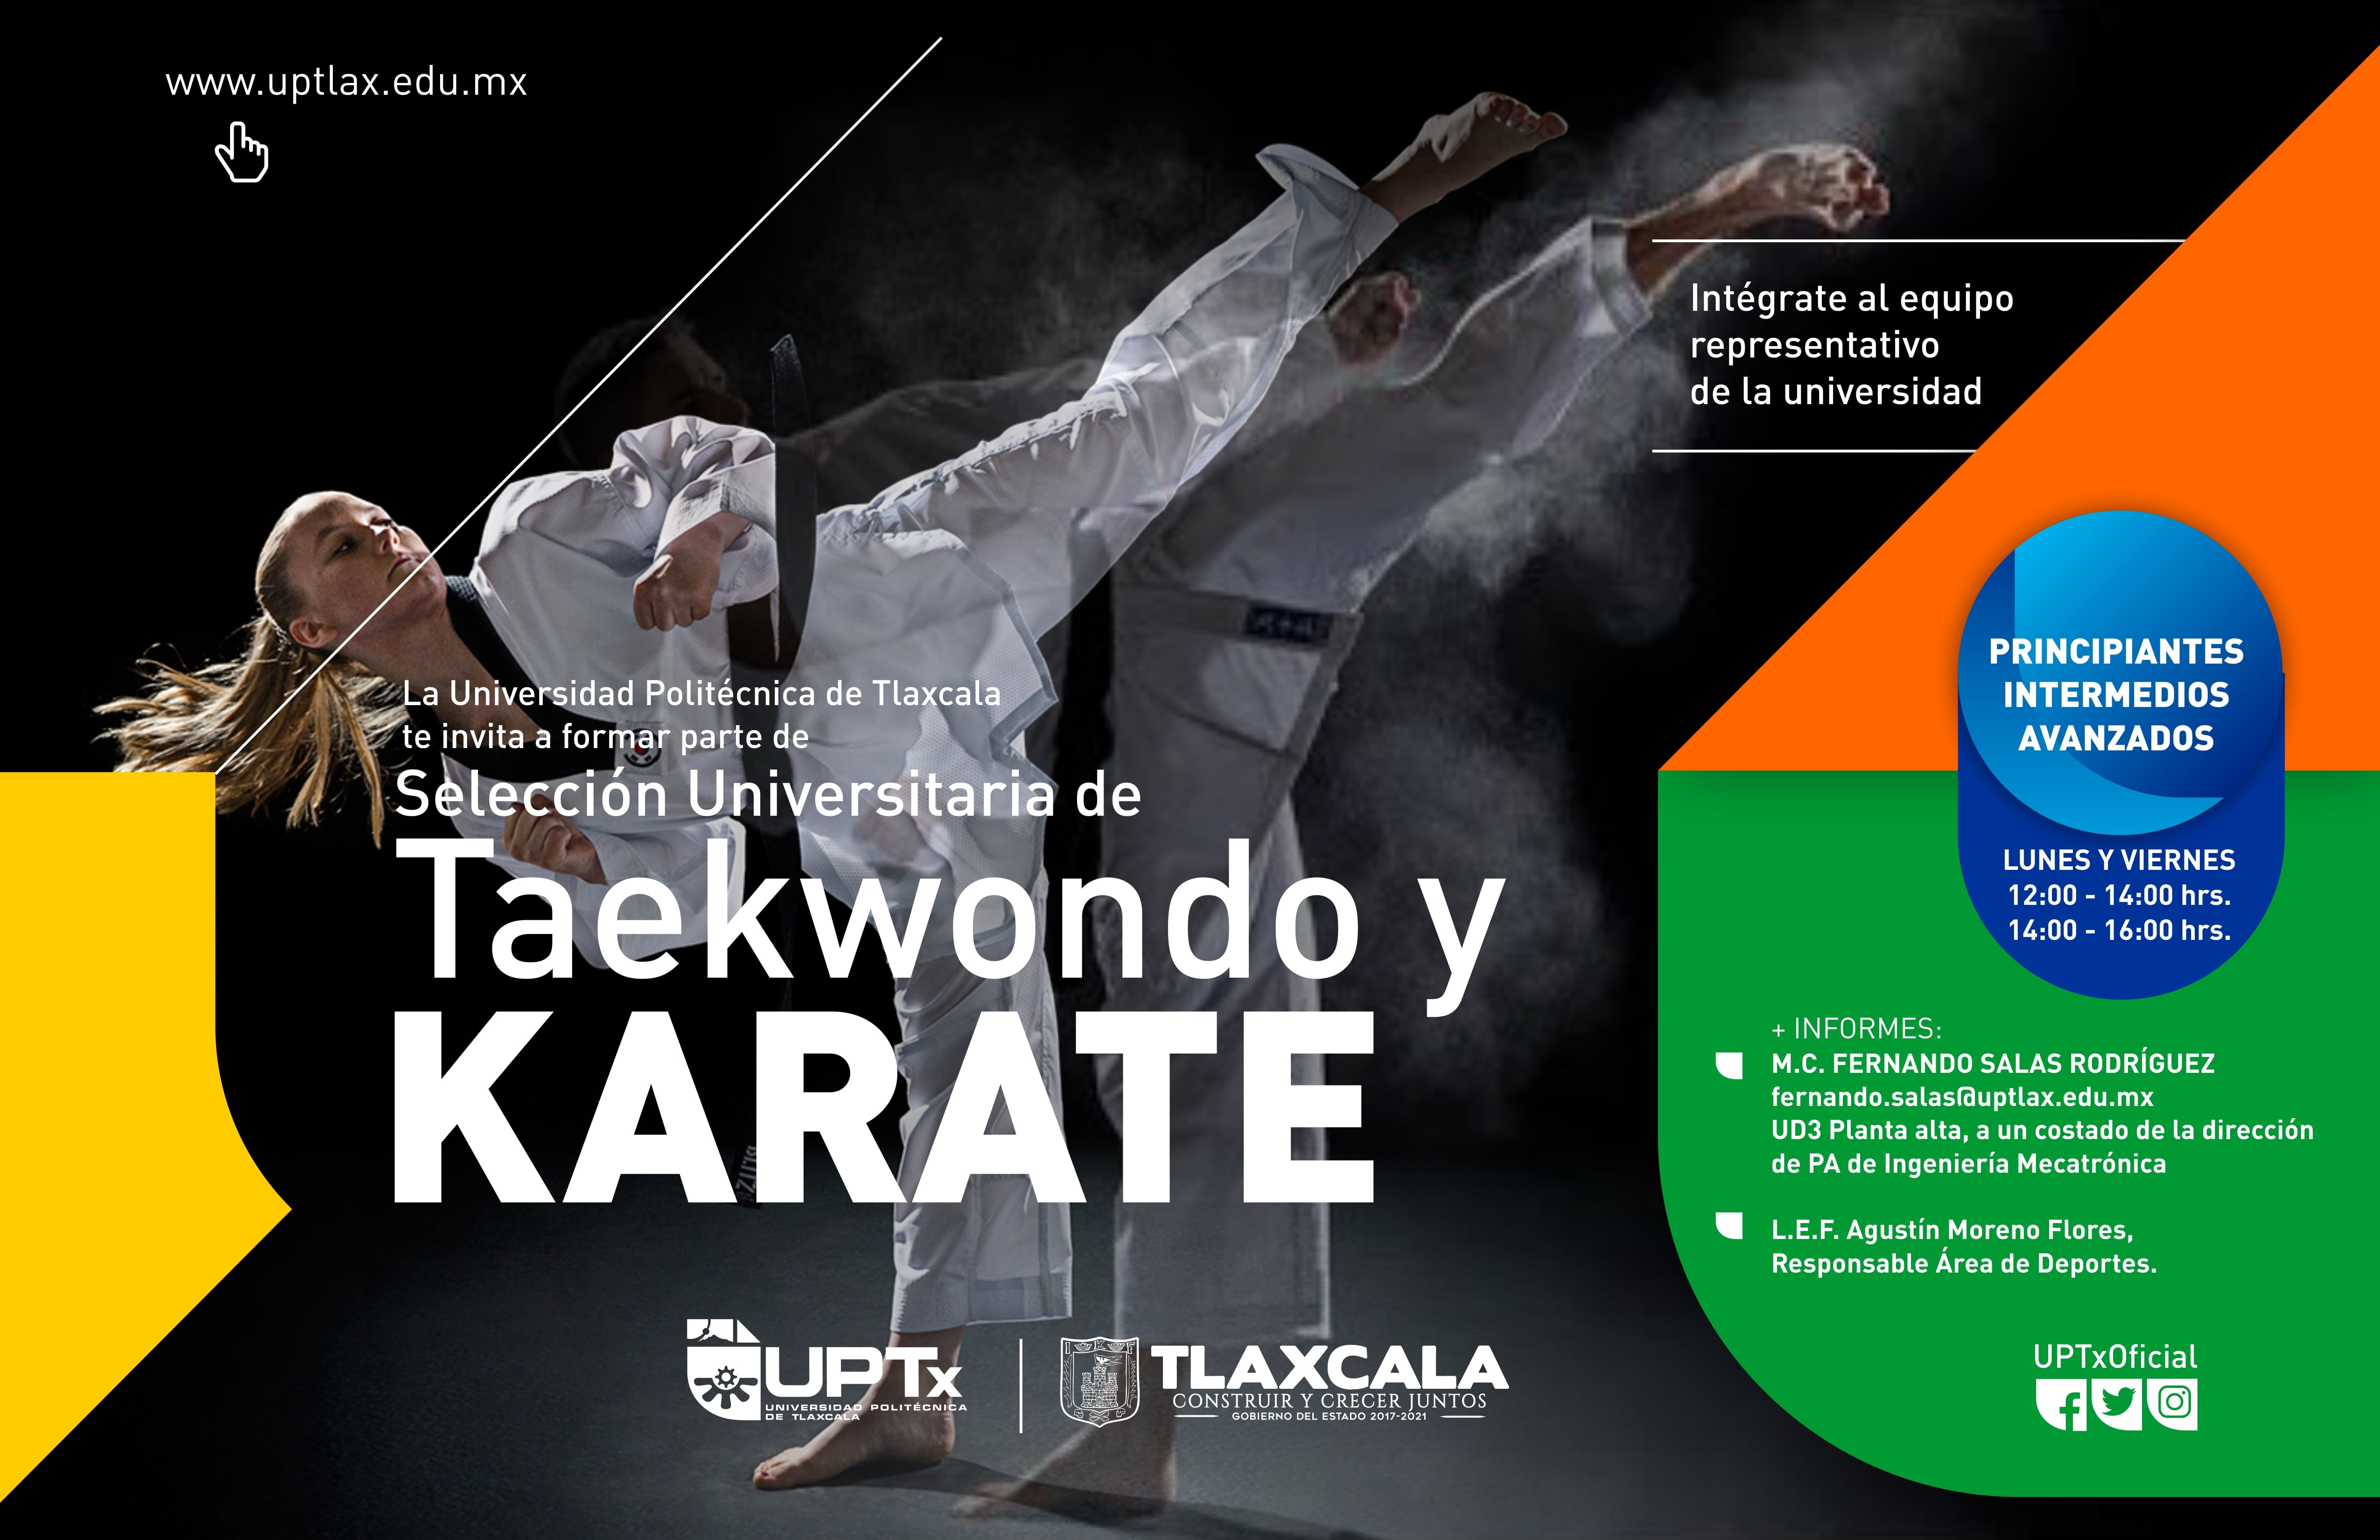 Taekwondo y Karate